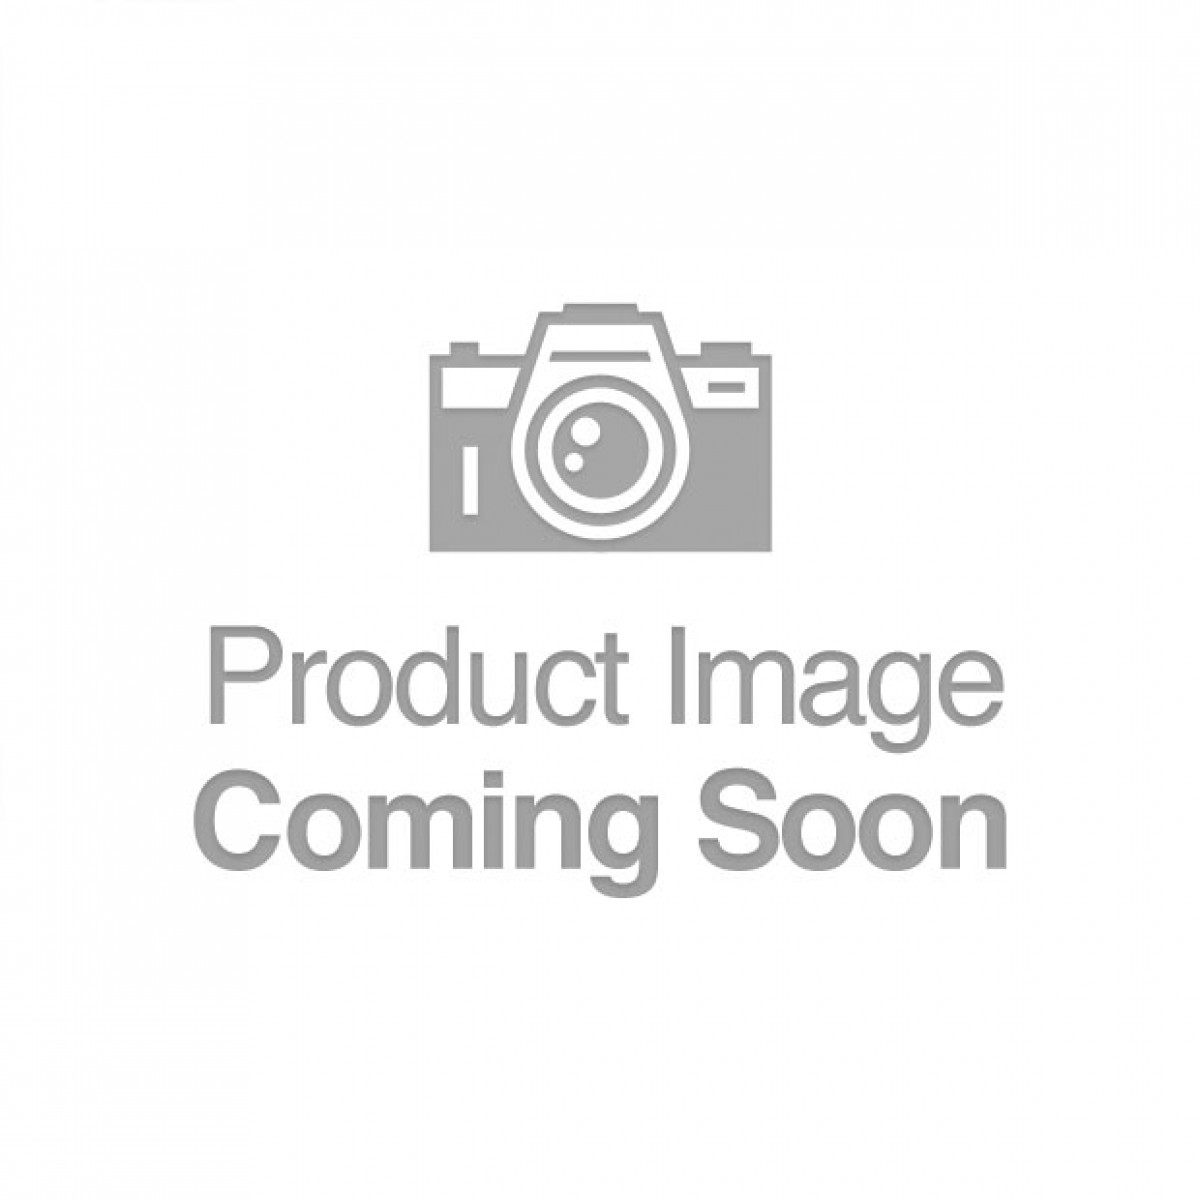 Curve Novelties Thinz Bailey Harness  - Black